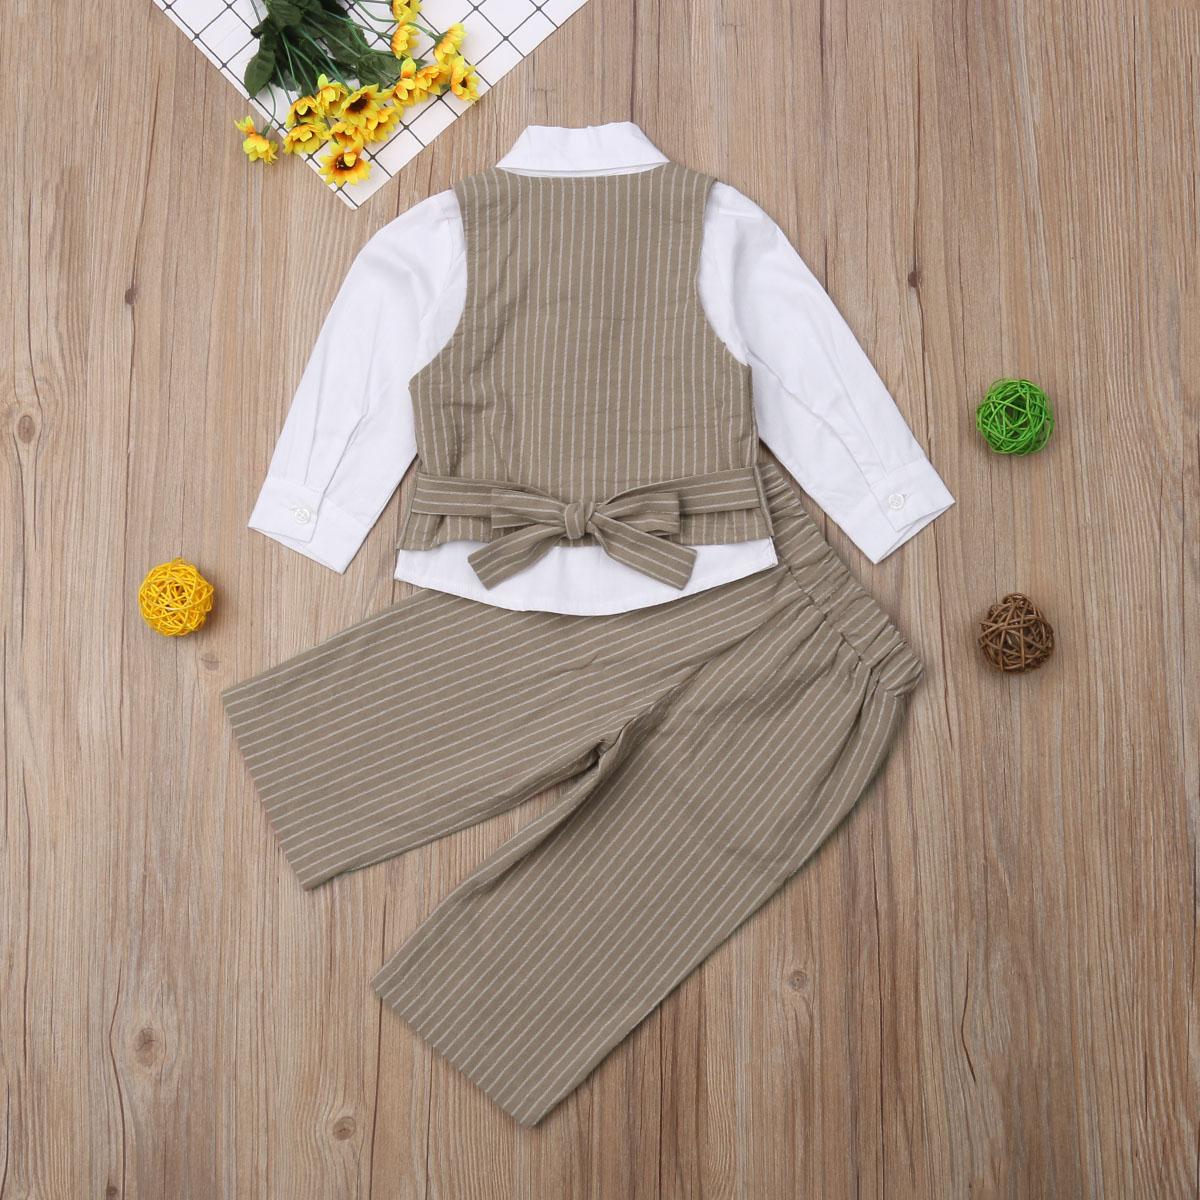 4pc Boy Toddler Formal White Bow tie White Khaki Black Shorts with Hat sz S-4T